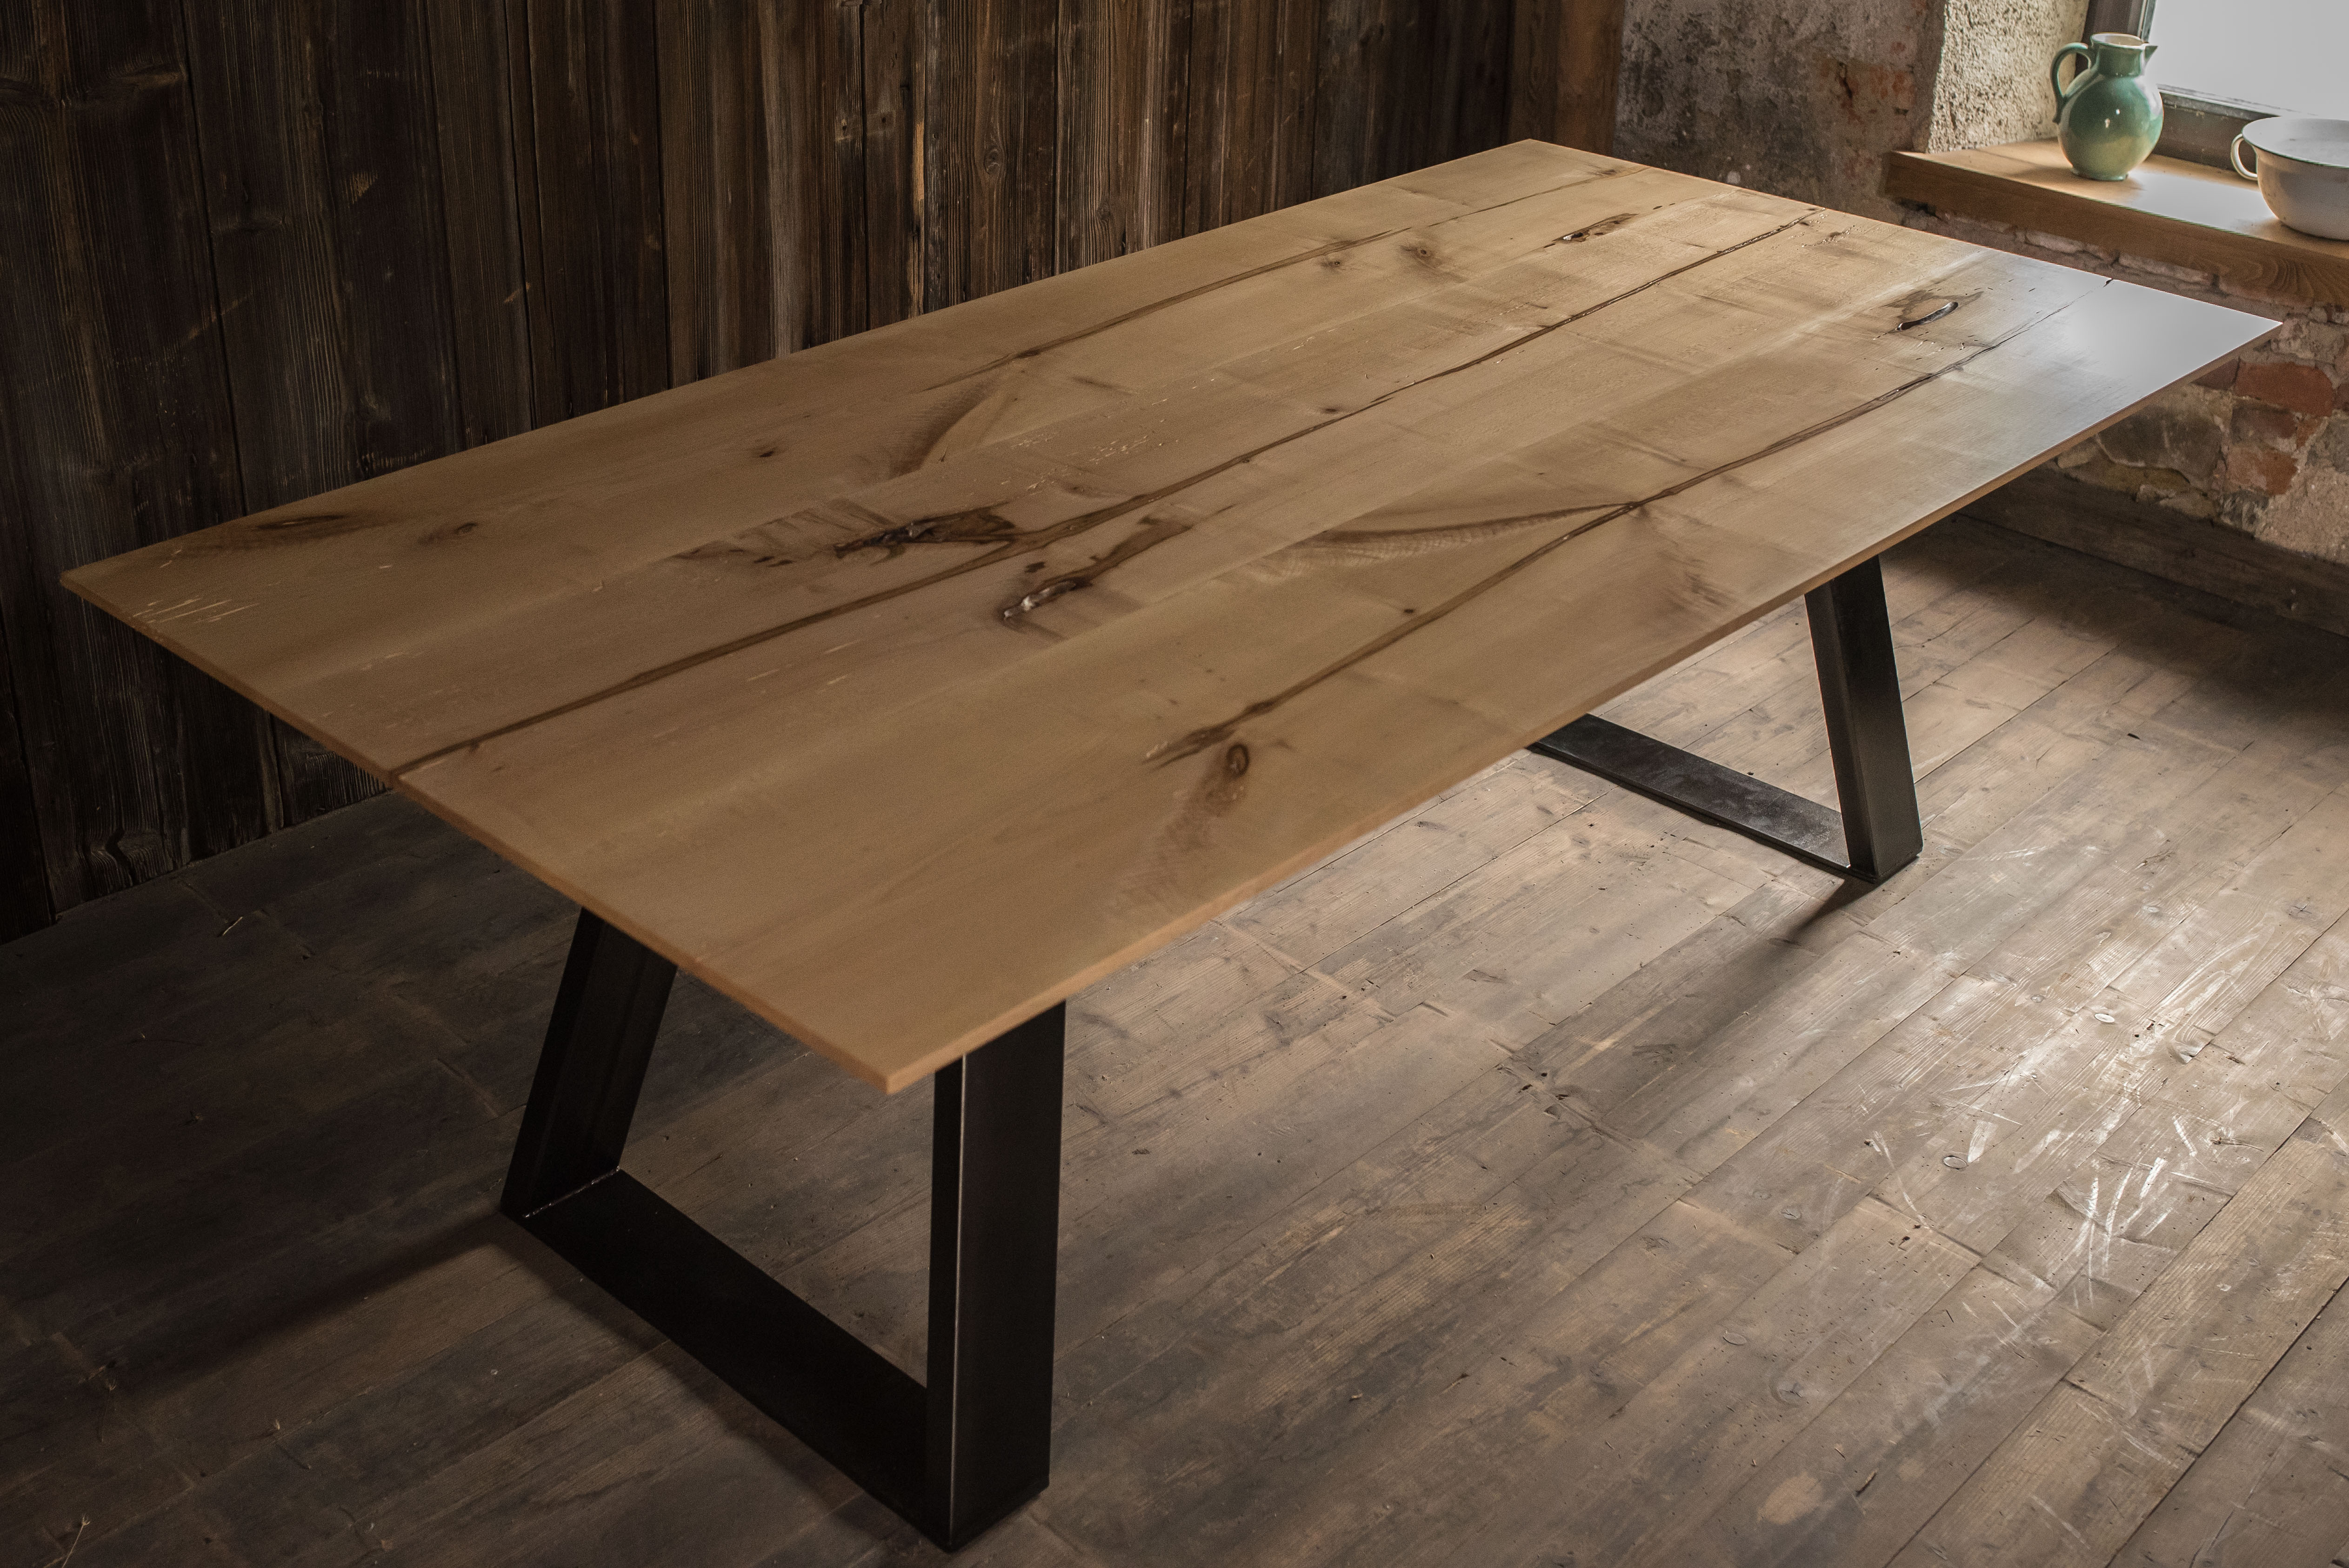 TABLE NºONE